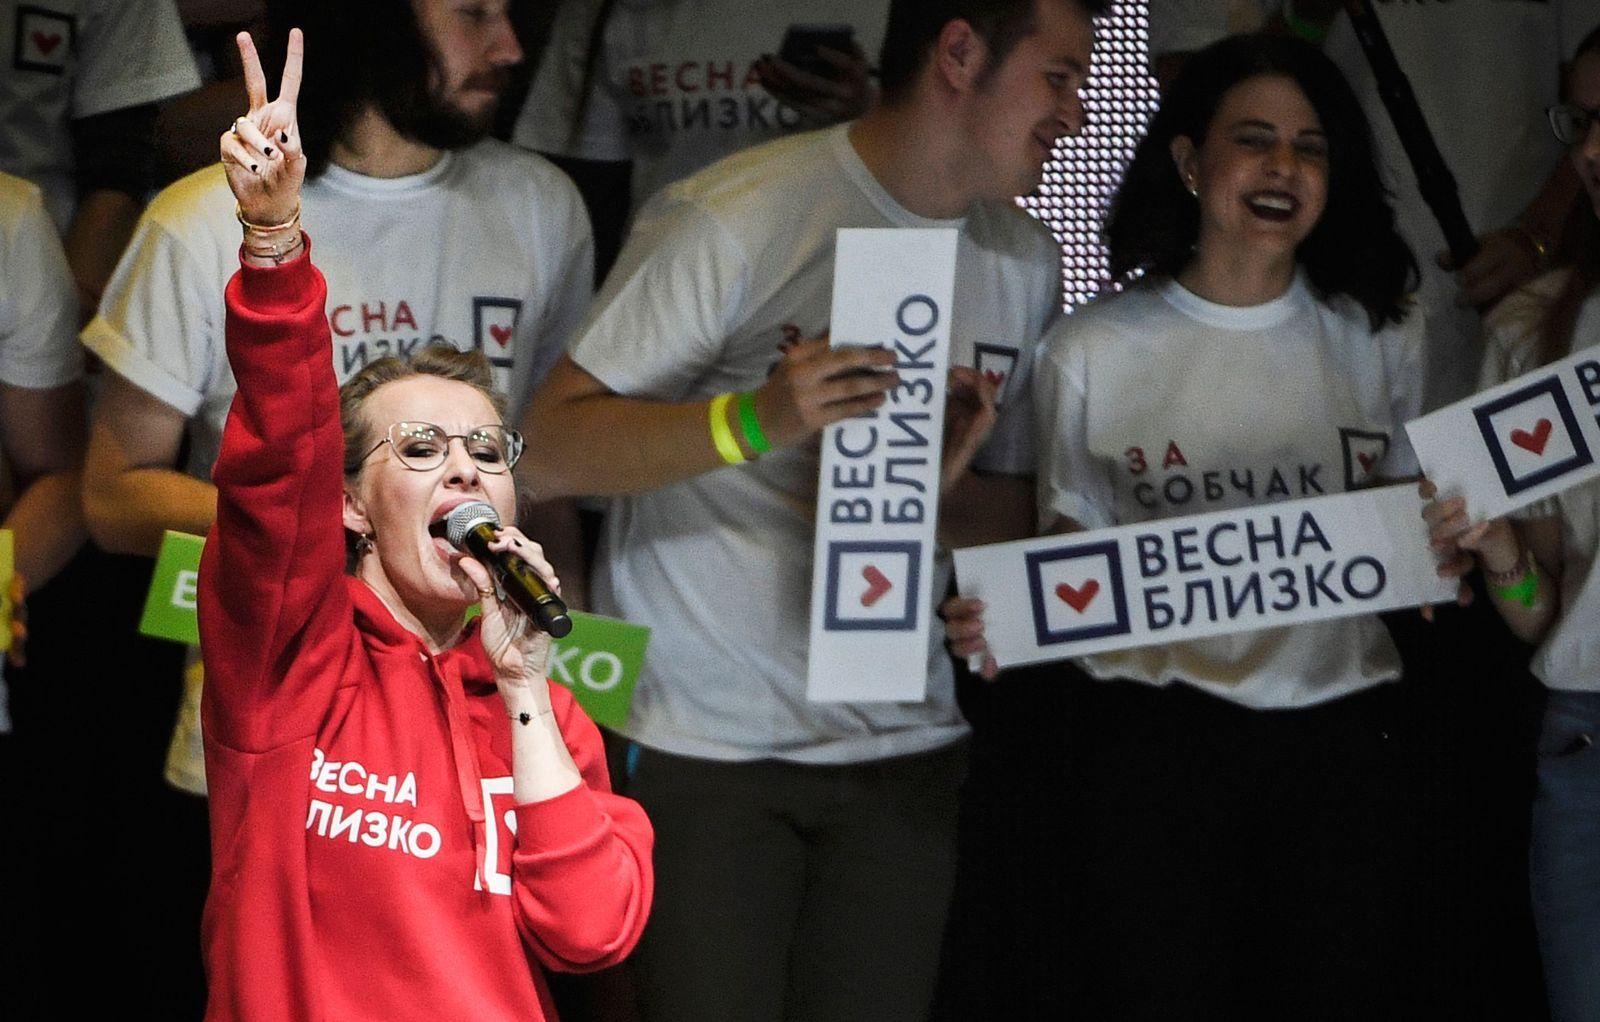 Russland/ Wahl vorab